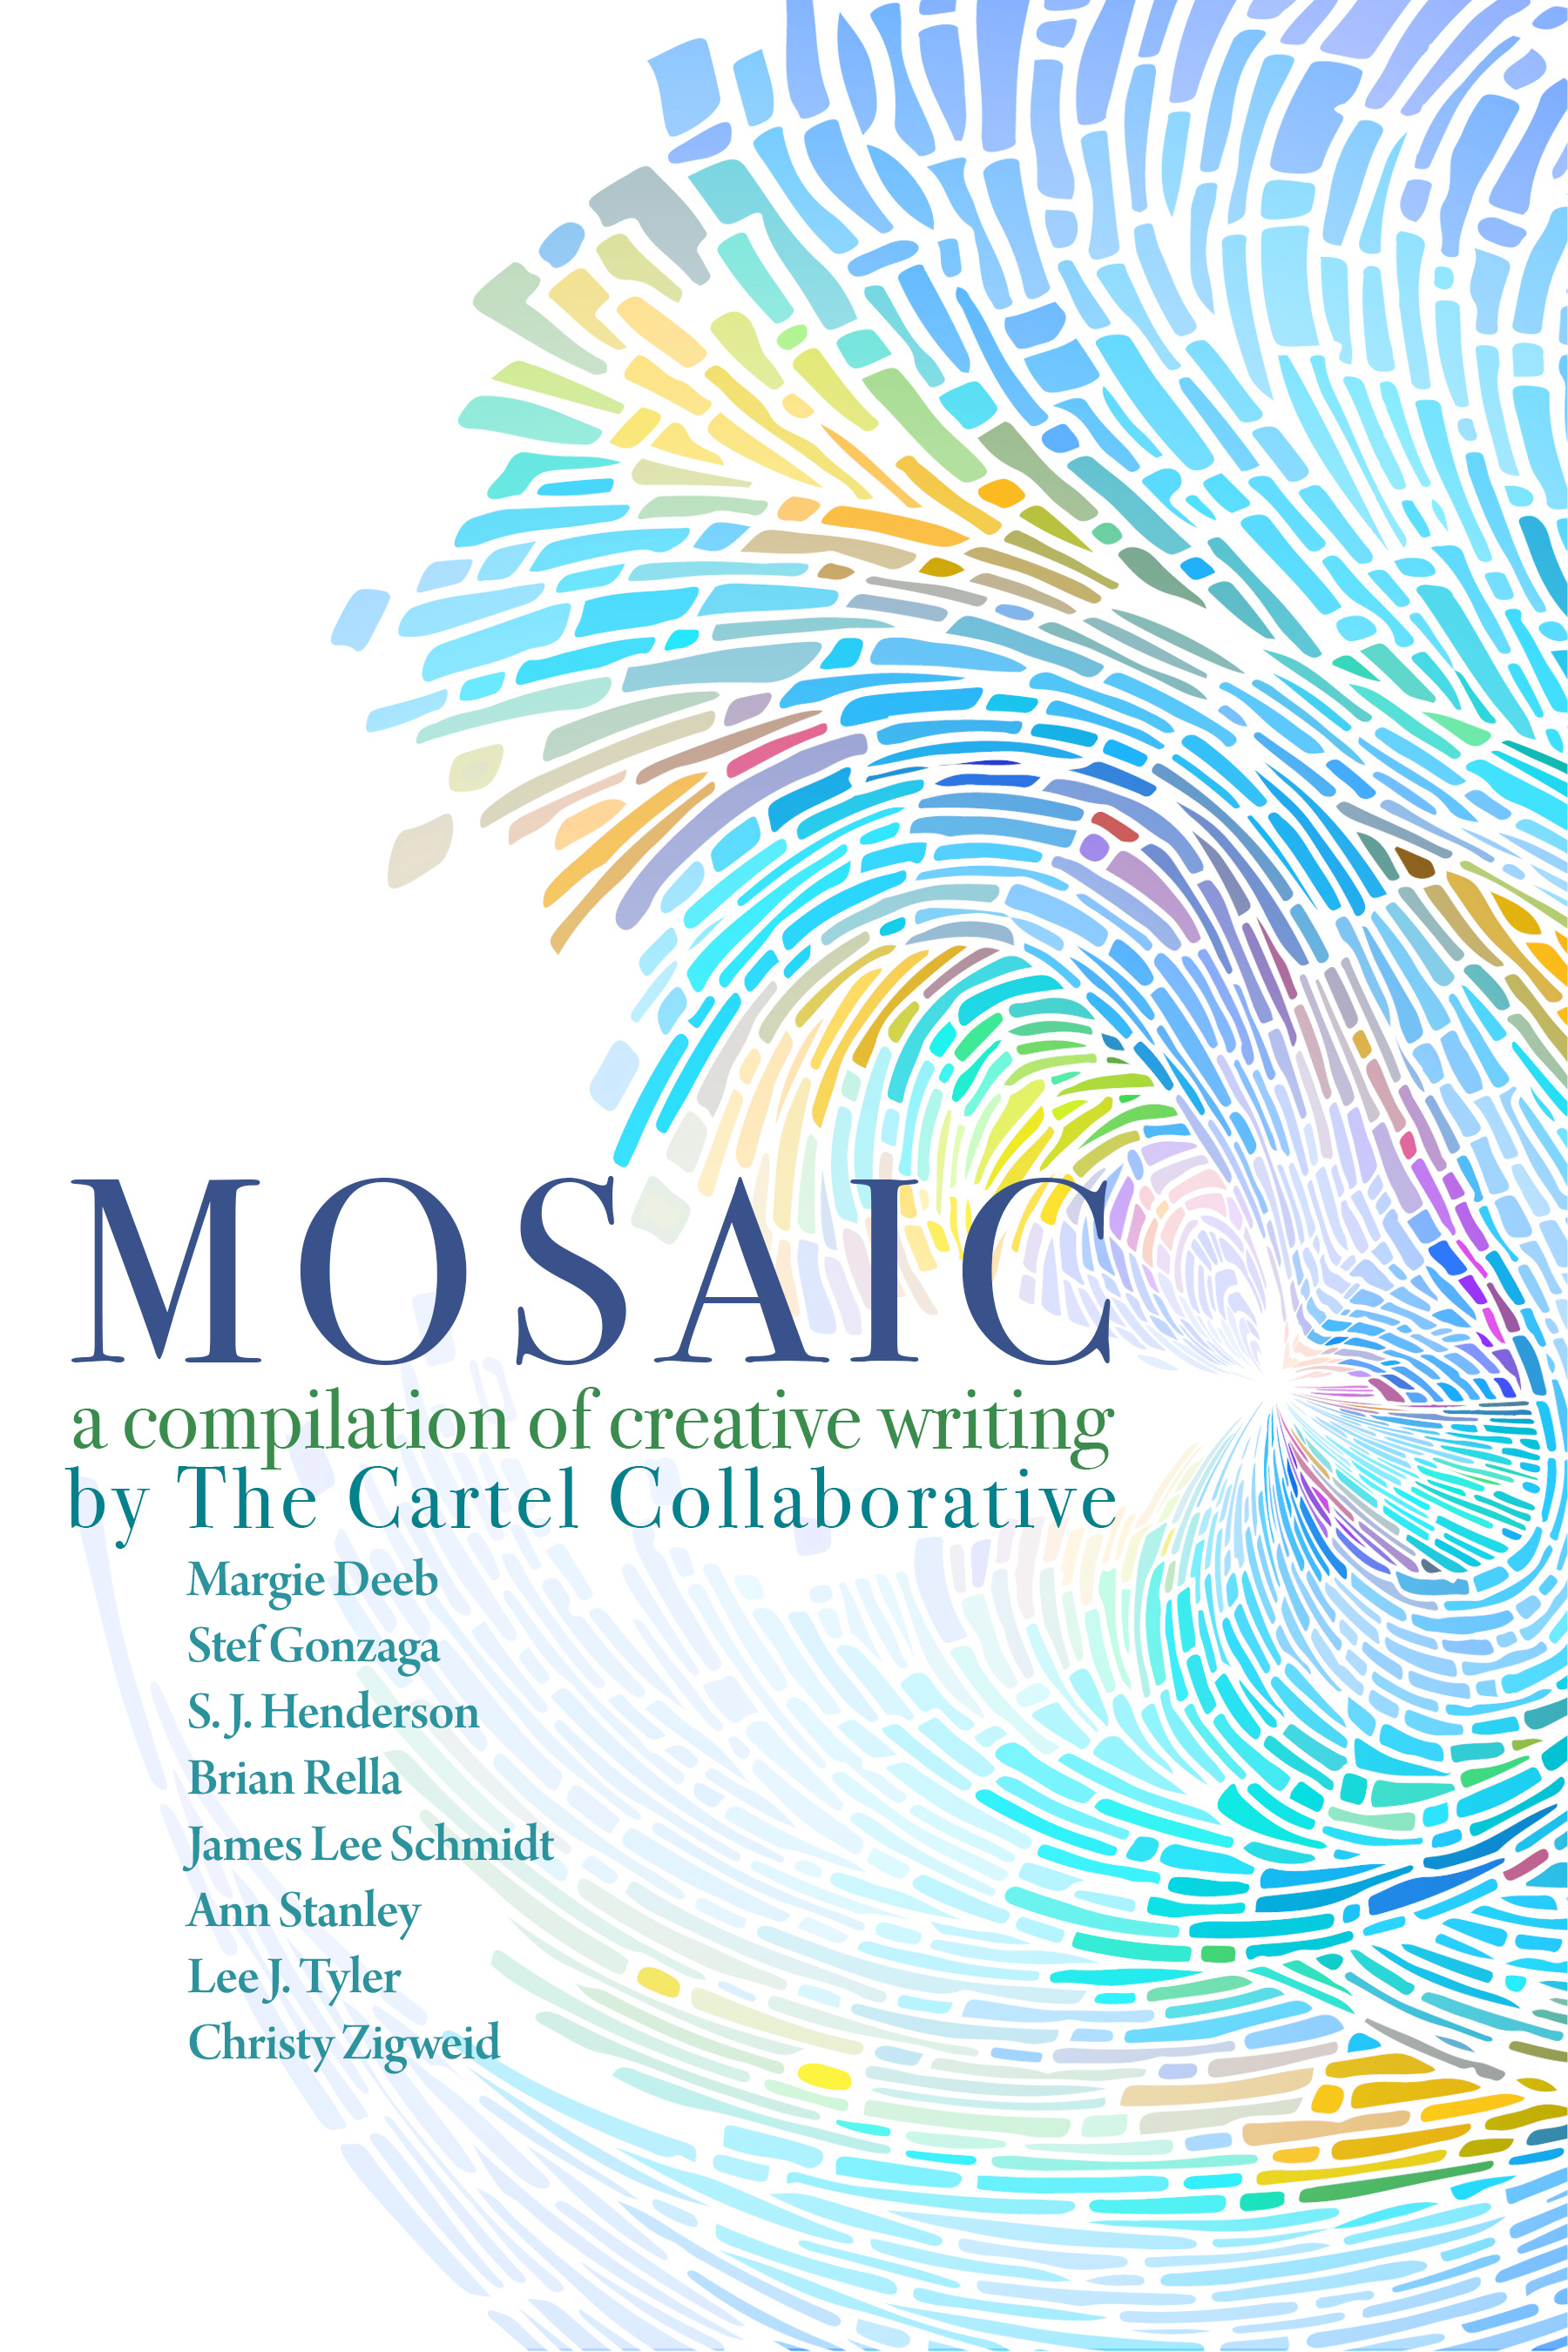 Mosaic-HR_author_names